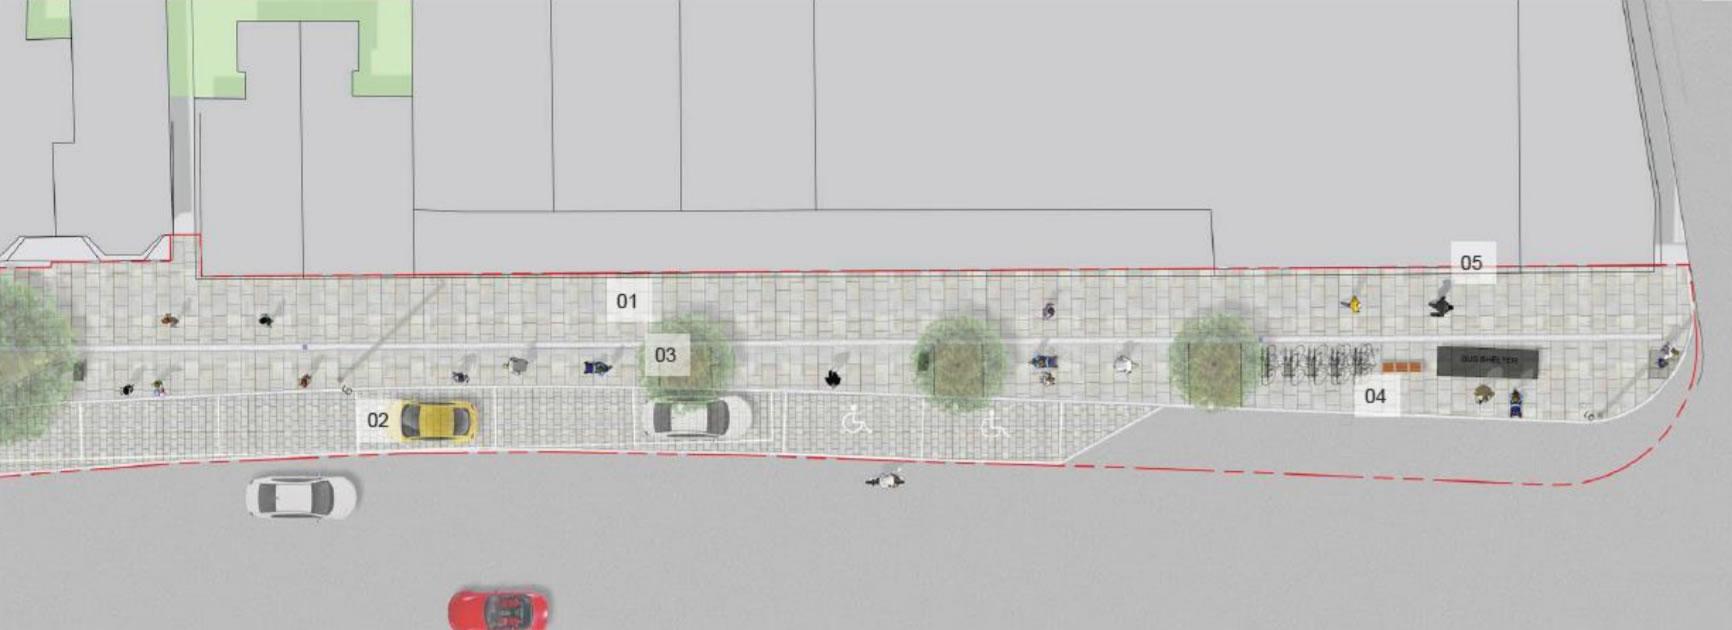 Weybridge Streetscape Scheme Plans - Waitrose end